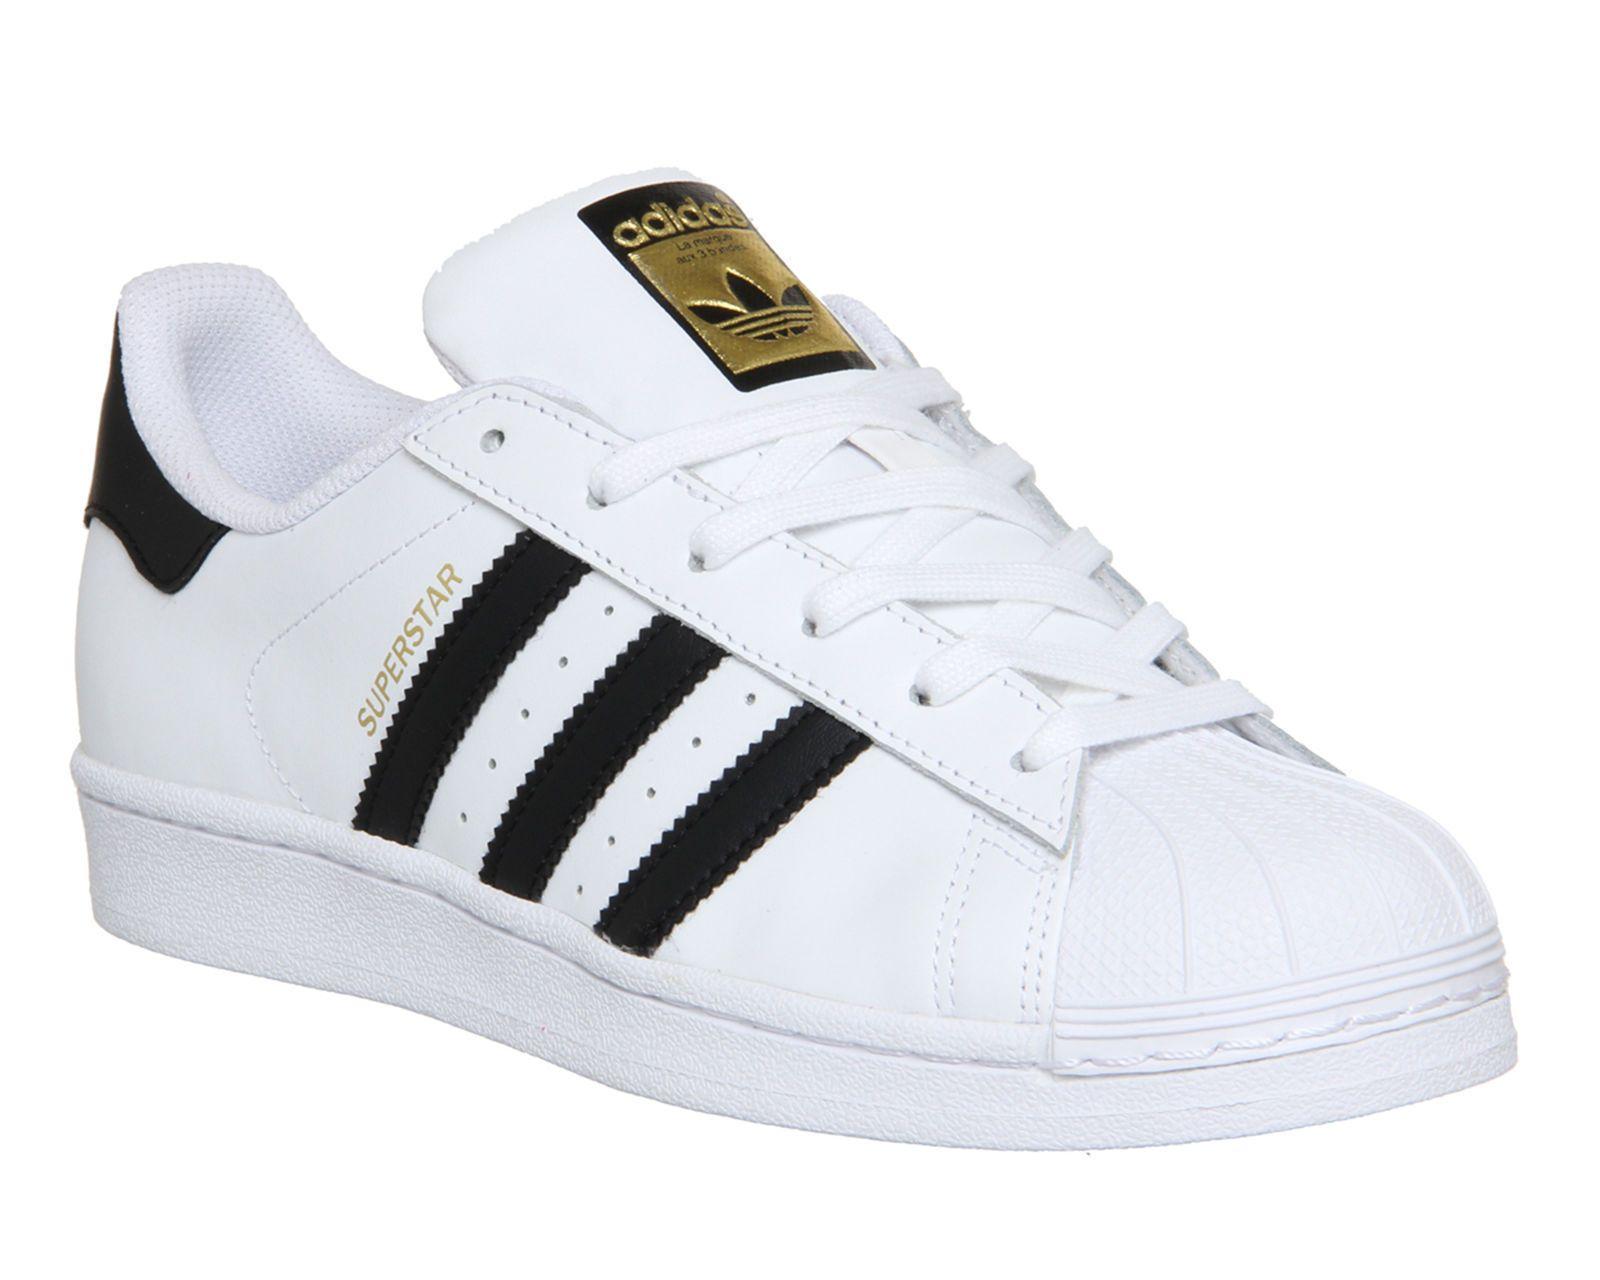 buy popular 01bc8 8df70 Adidas Superstar Unisex Men s   Women s WHITE BLACK FOUNDATION Trainers  Shoes